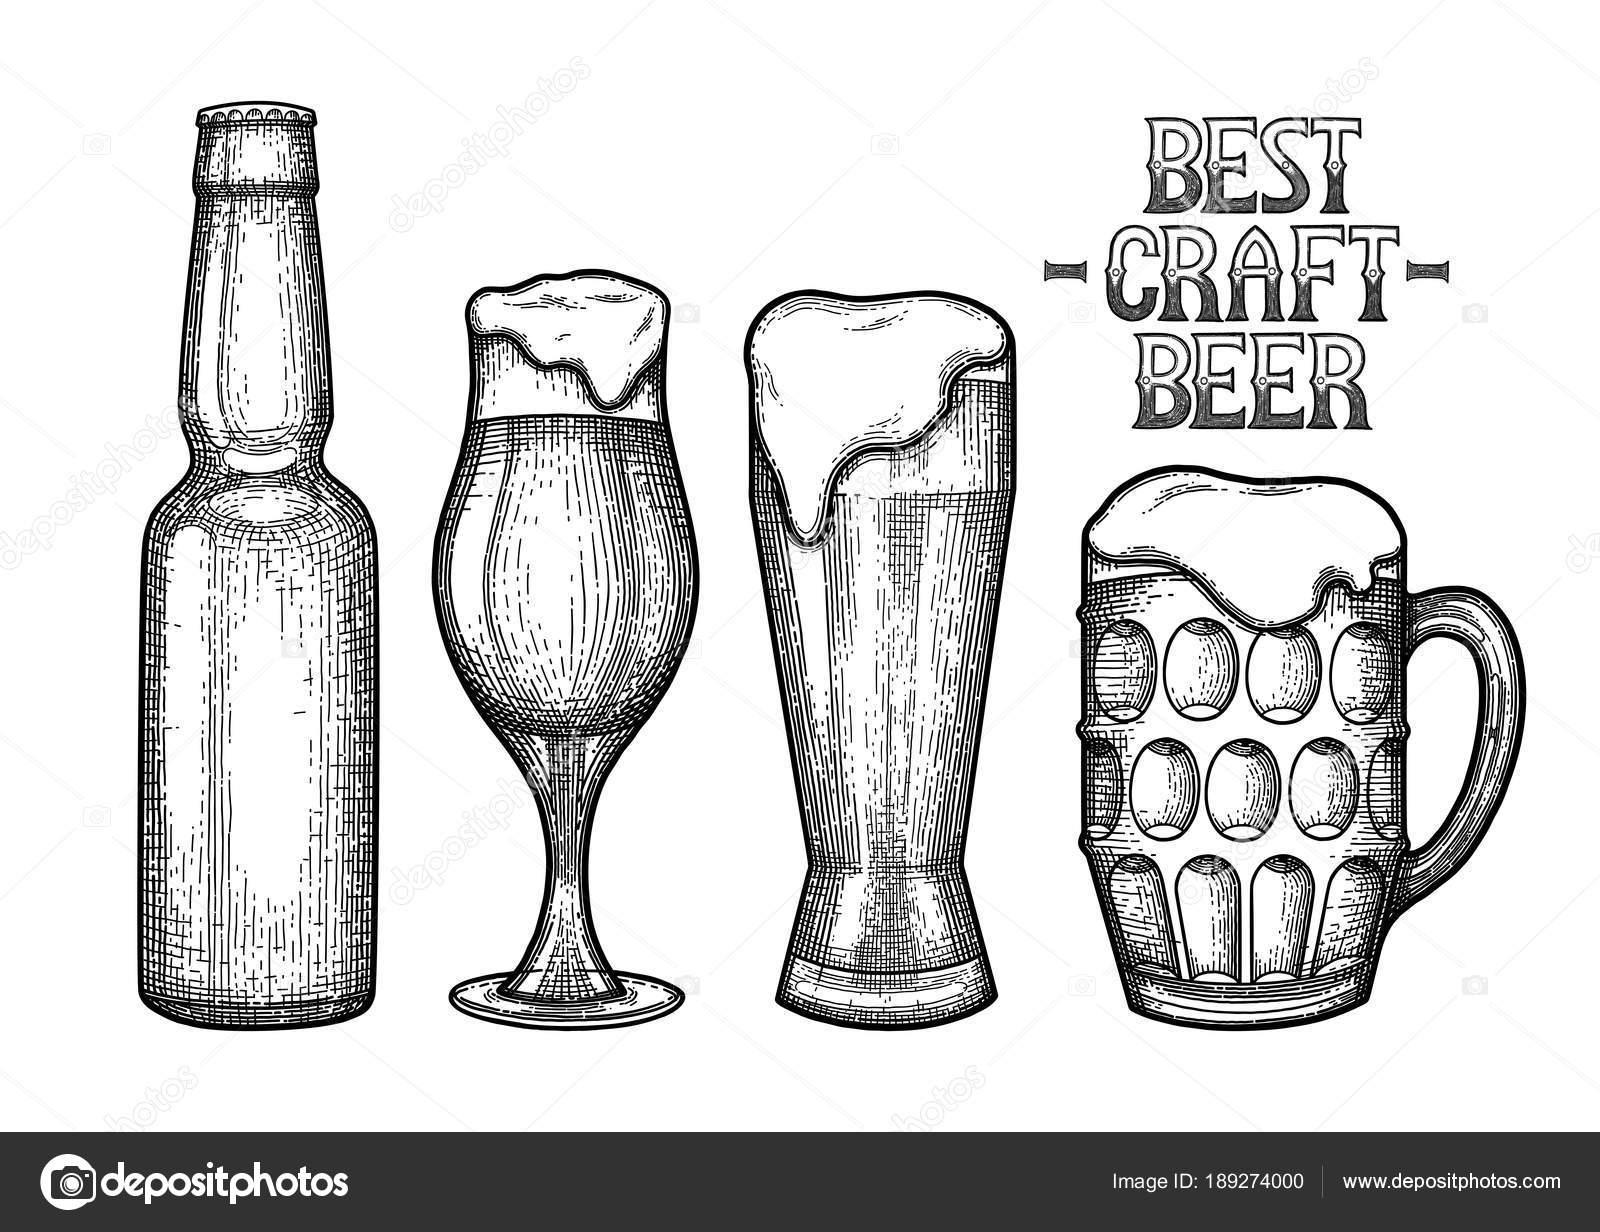 Botella De Cerveza Dibujo: Calquiar Pra Una Cerveza